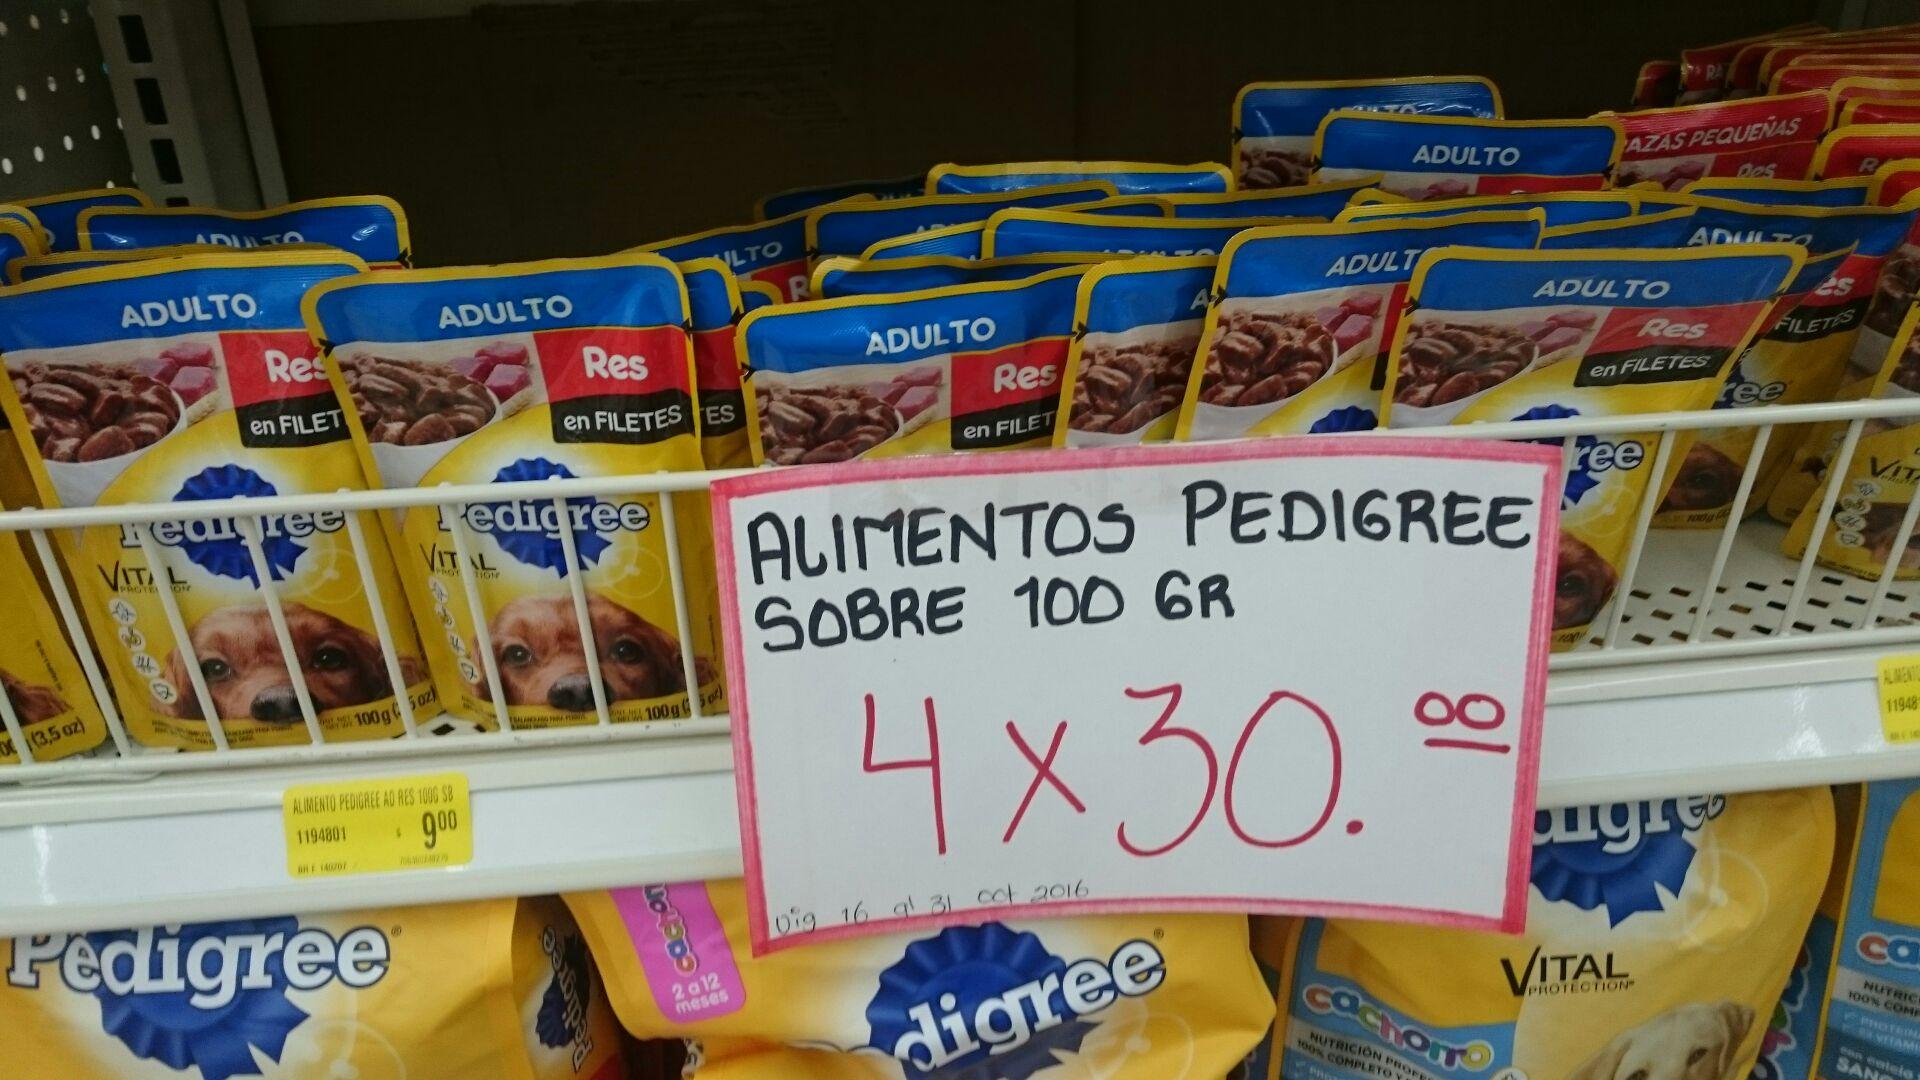 Farmacias Guadalajara:Sobres pedigree